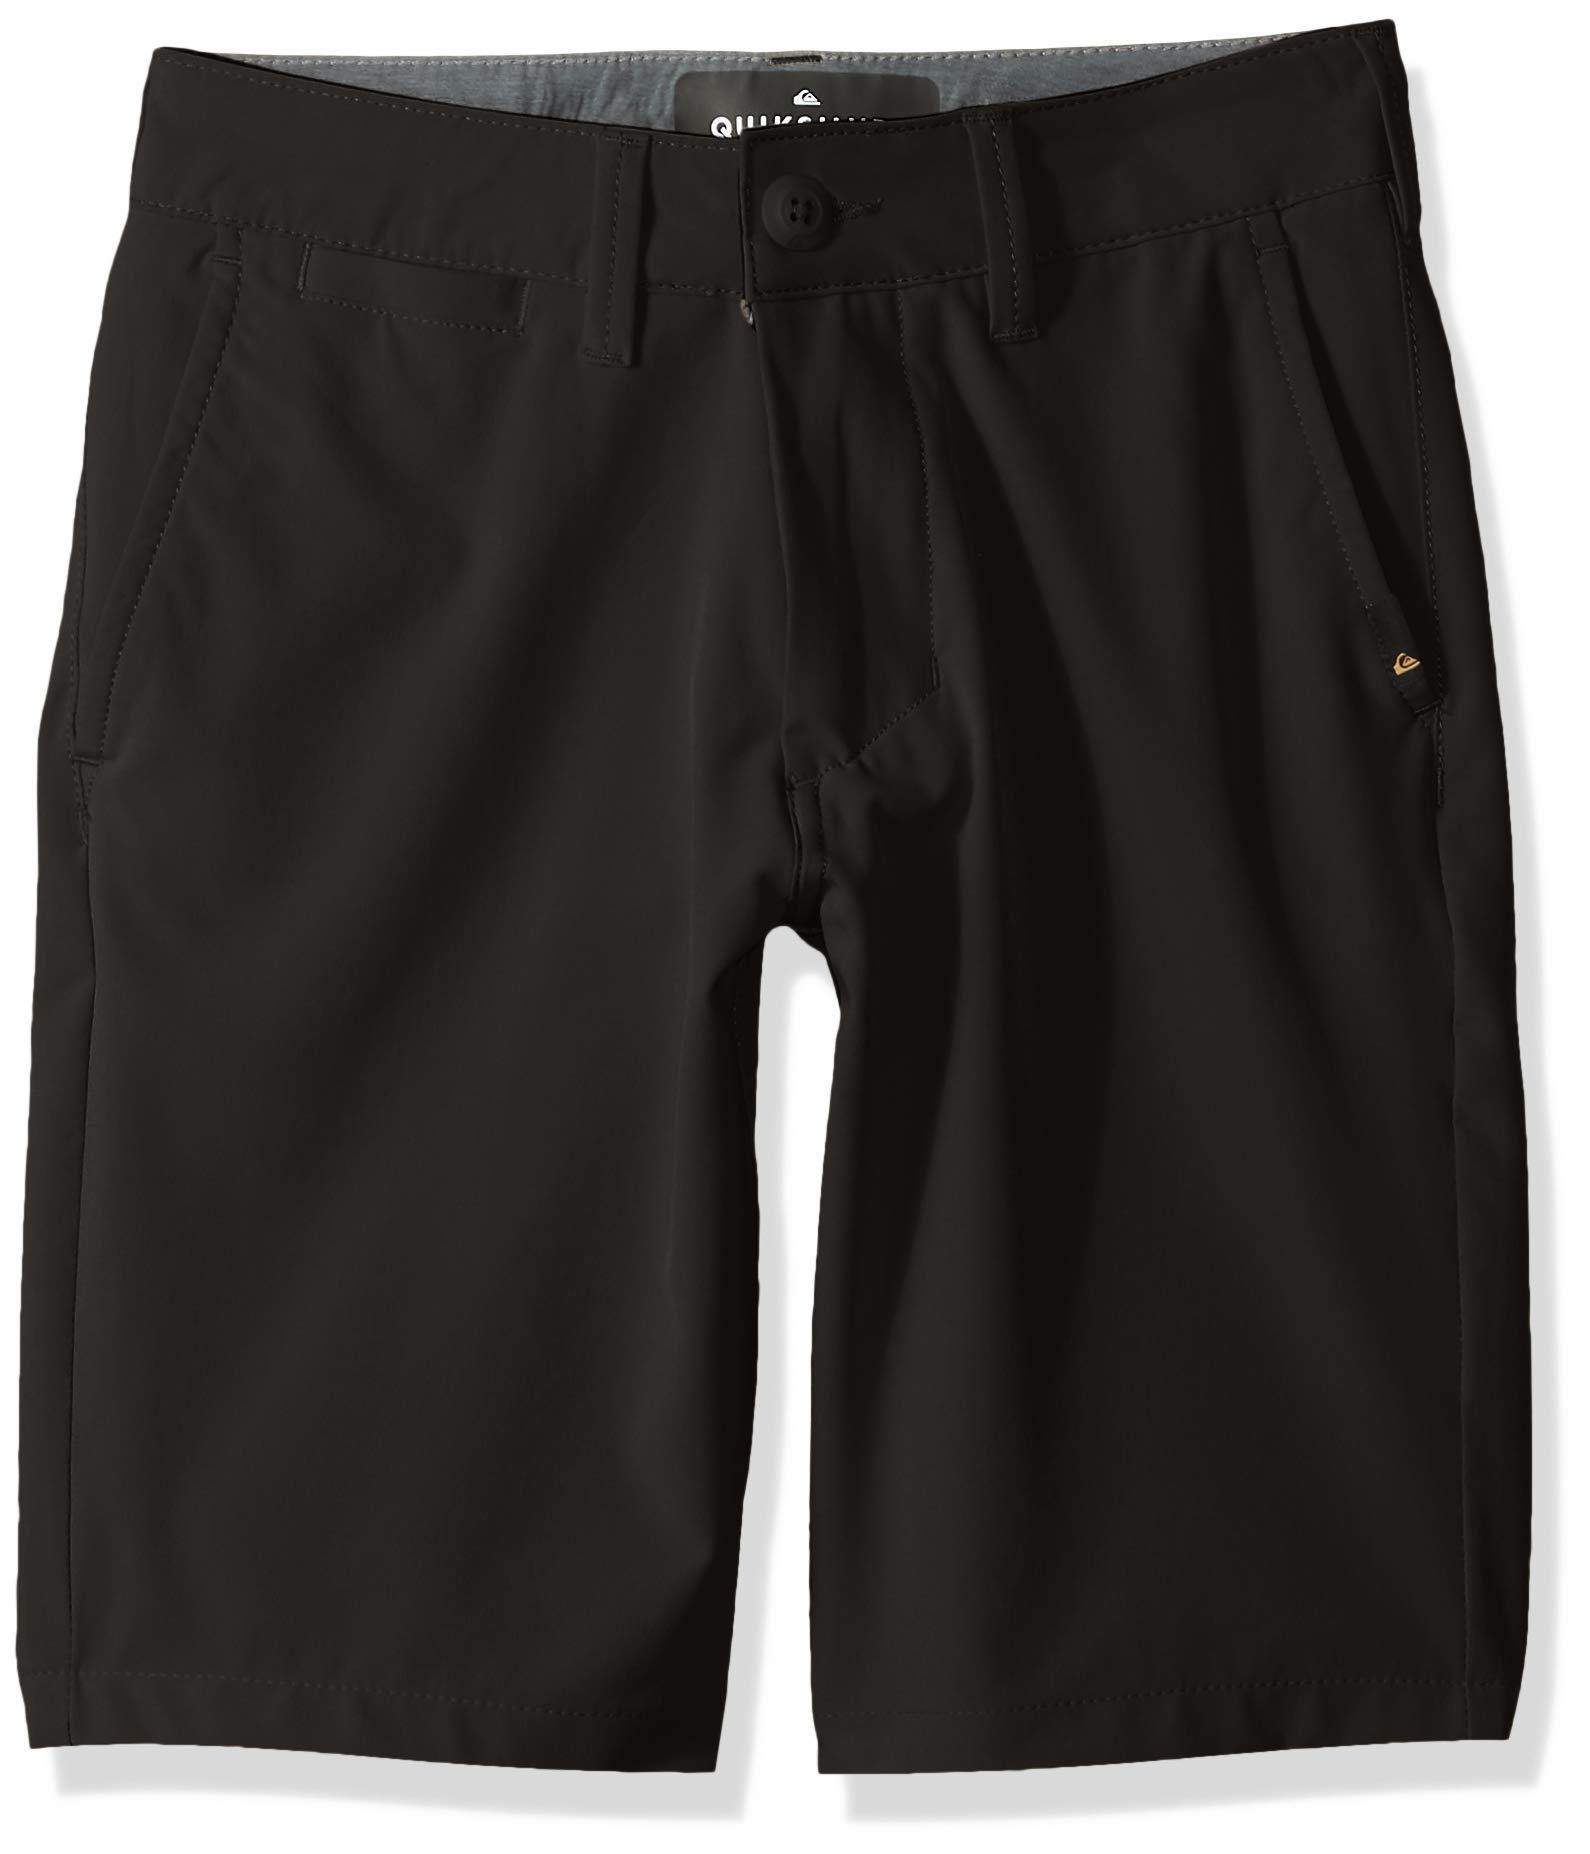 Quiksilver Boys' Big Union Amphibian Youth 19 Hybrid Short, Black 26/12